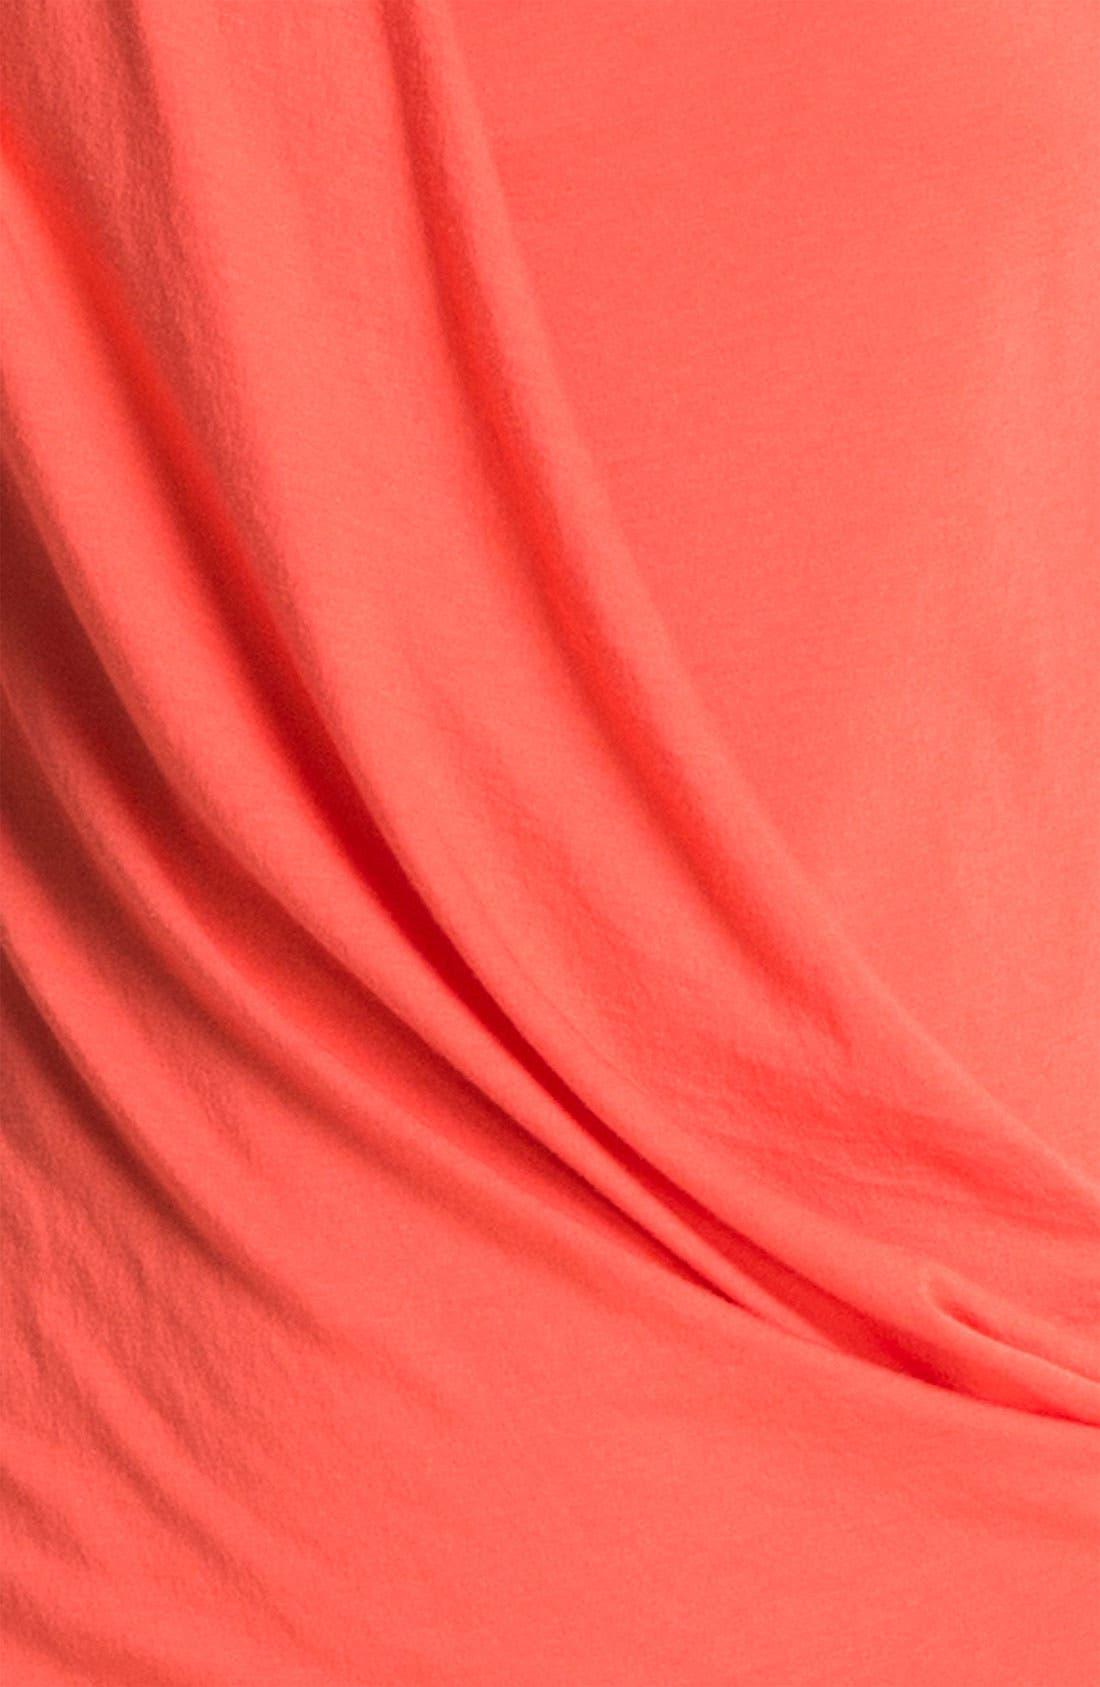 Alternate Image 3  - HELMUT Helmut Lang 'Feather' Draped Jersey Dress